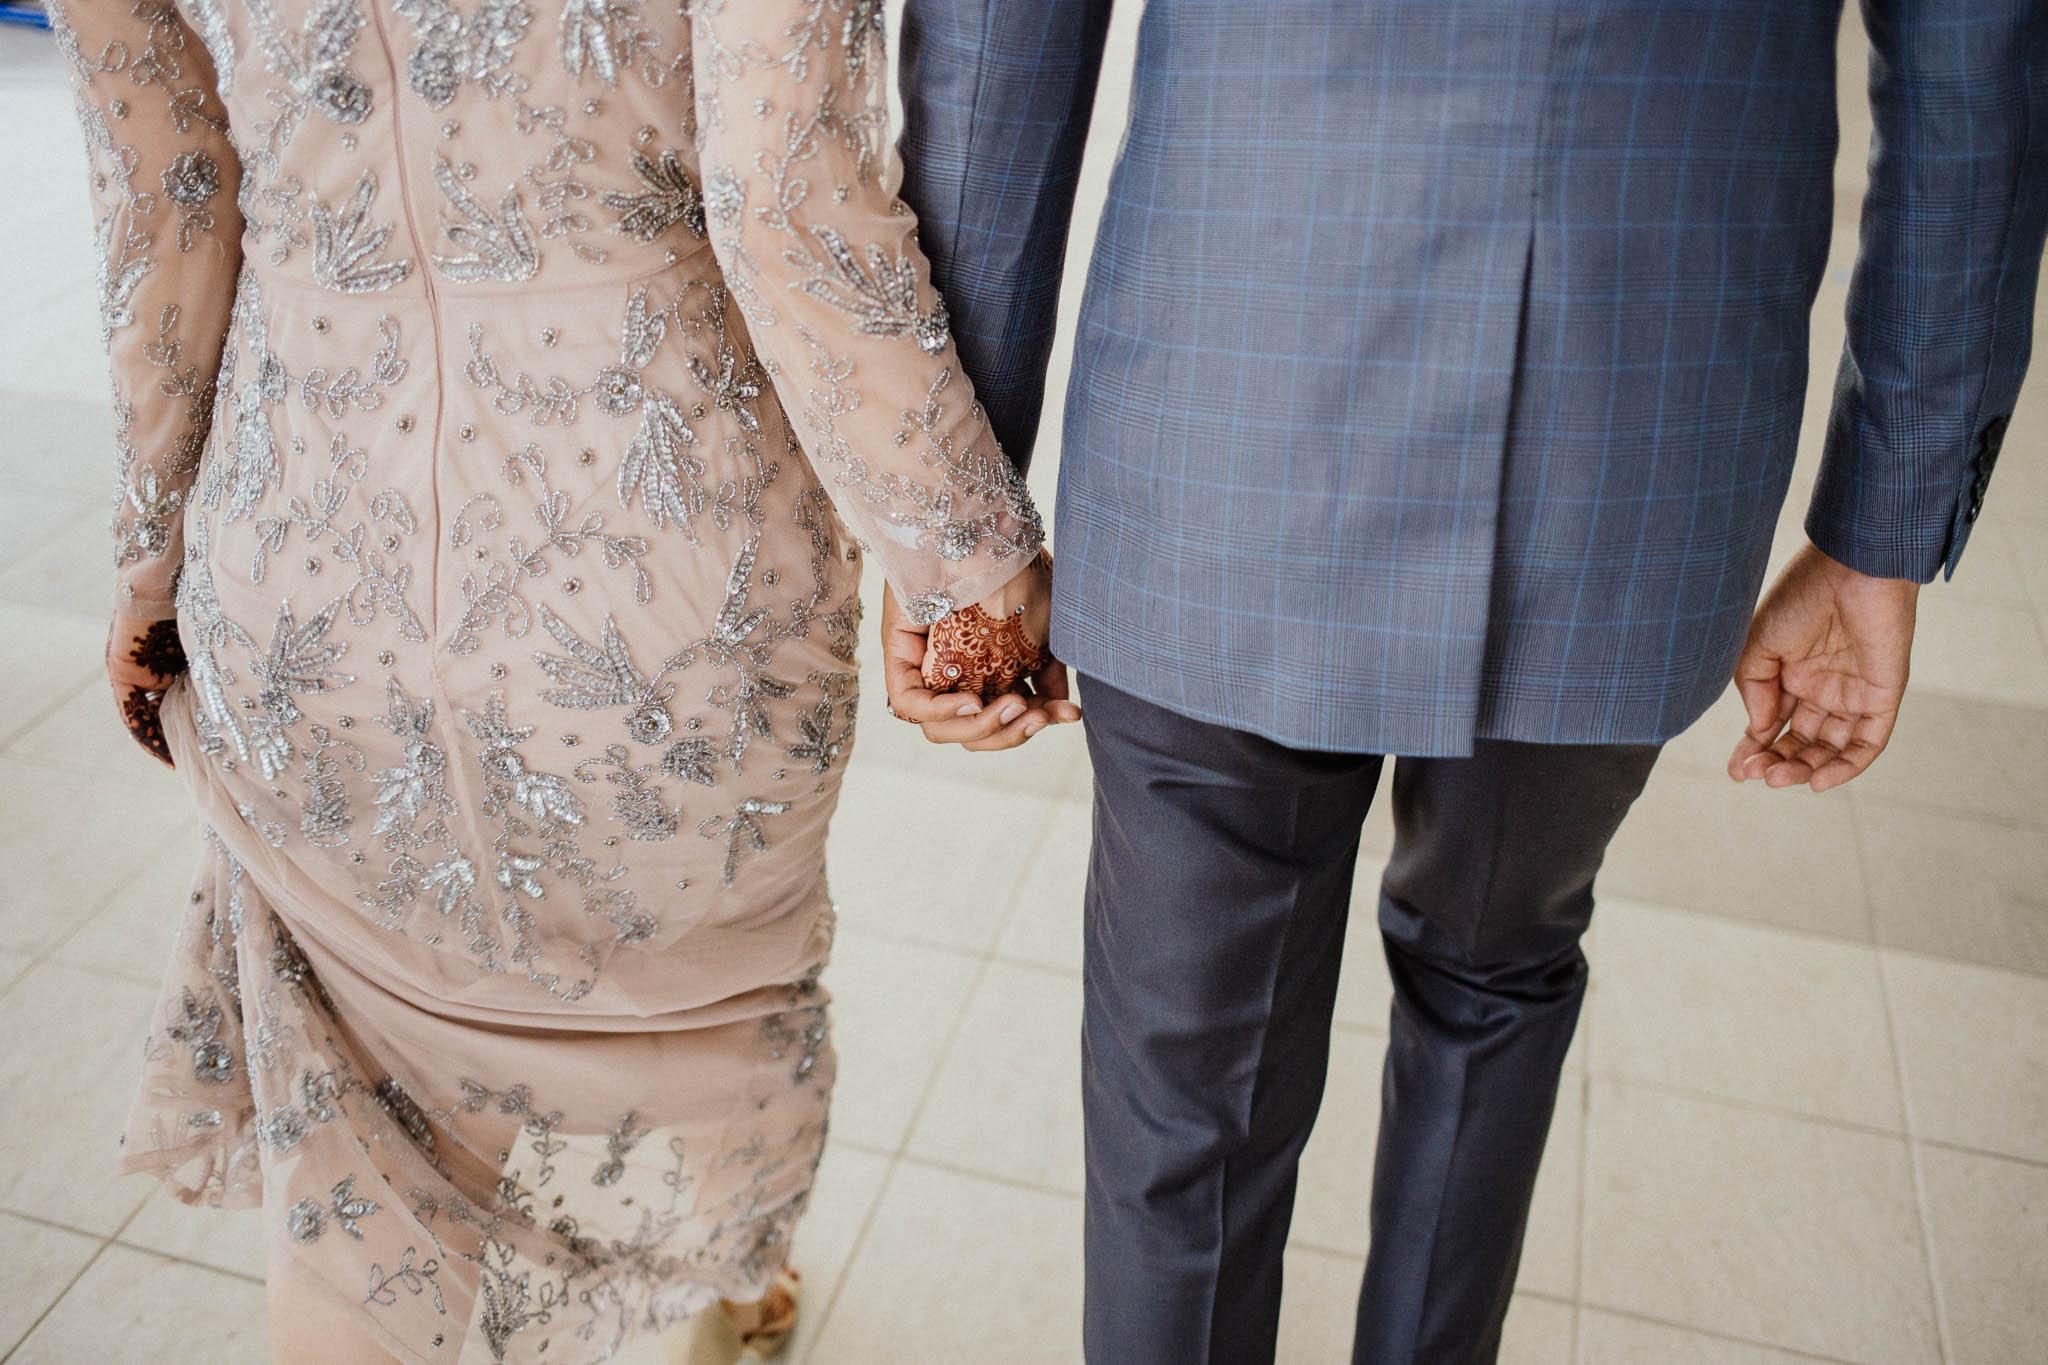 singapore-wedding-photographer-addafiq-nufail-043.jpg